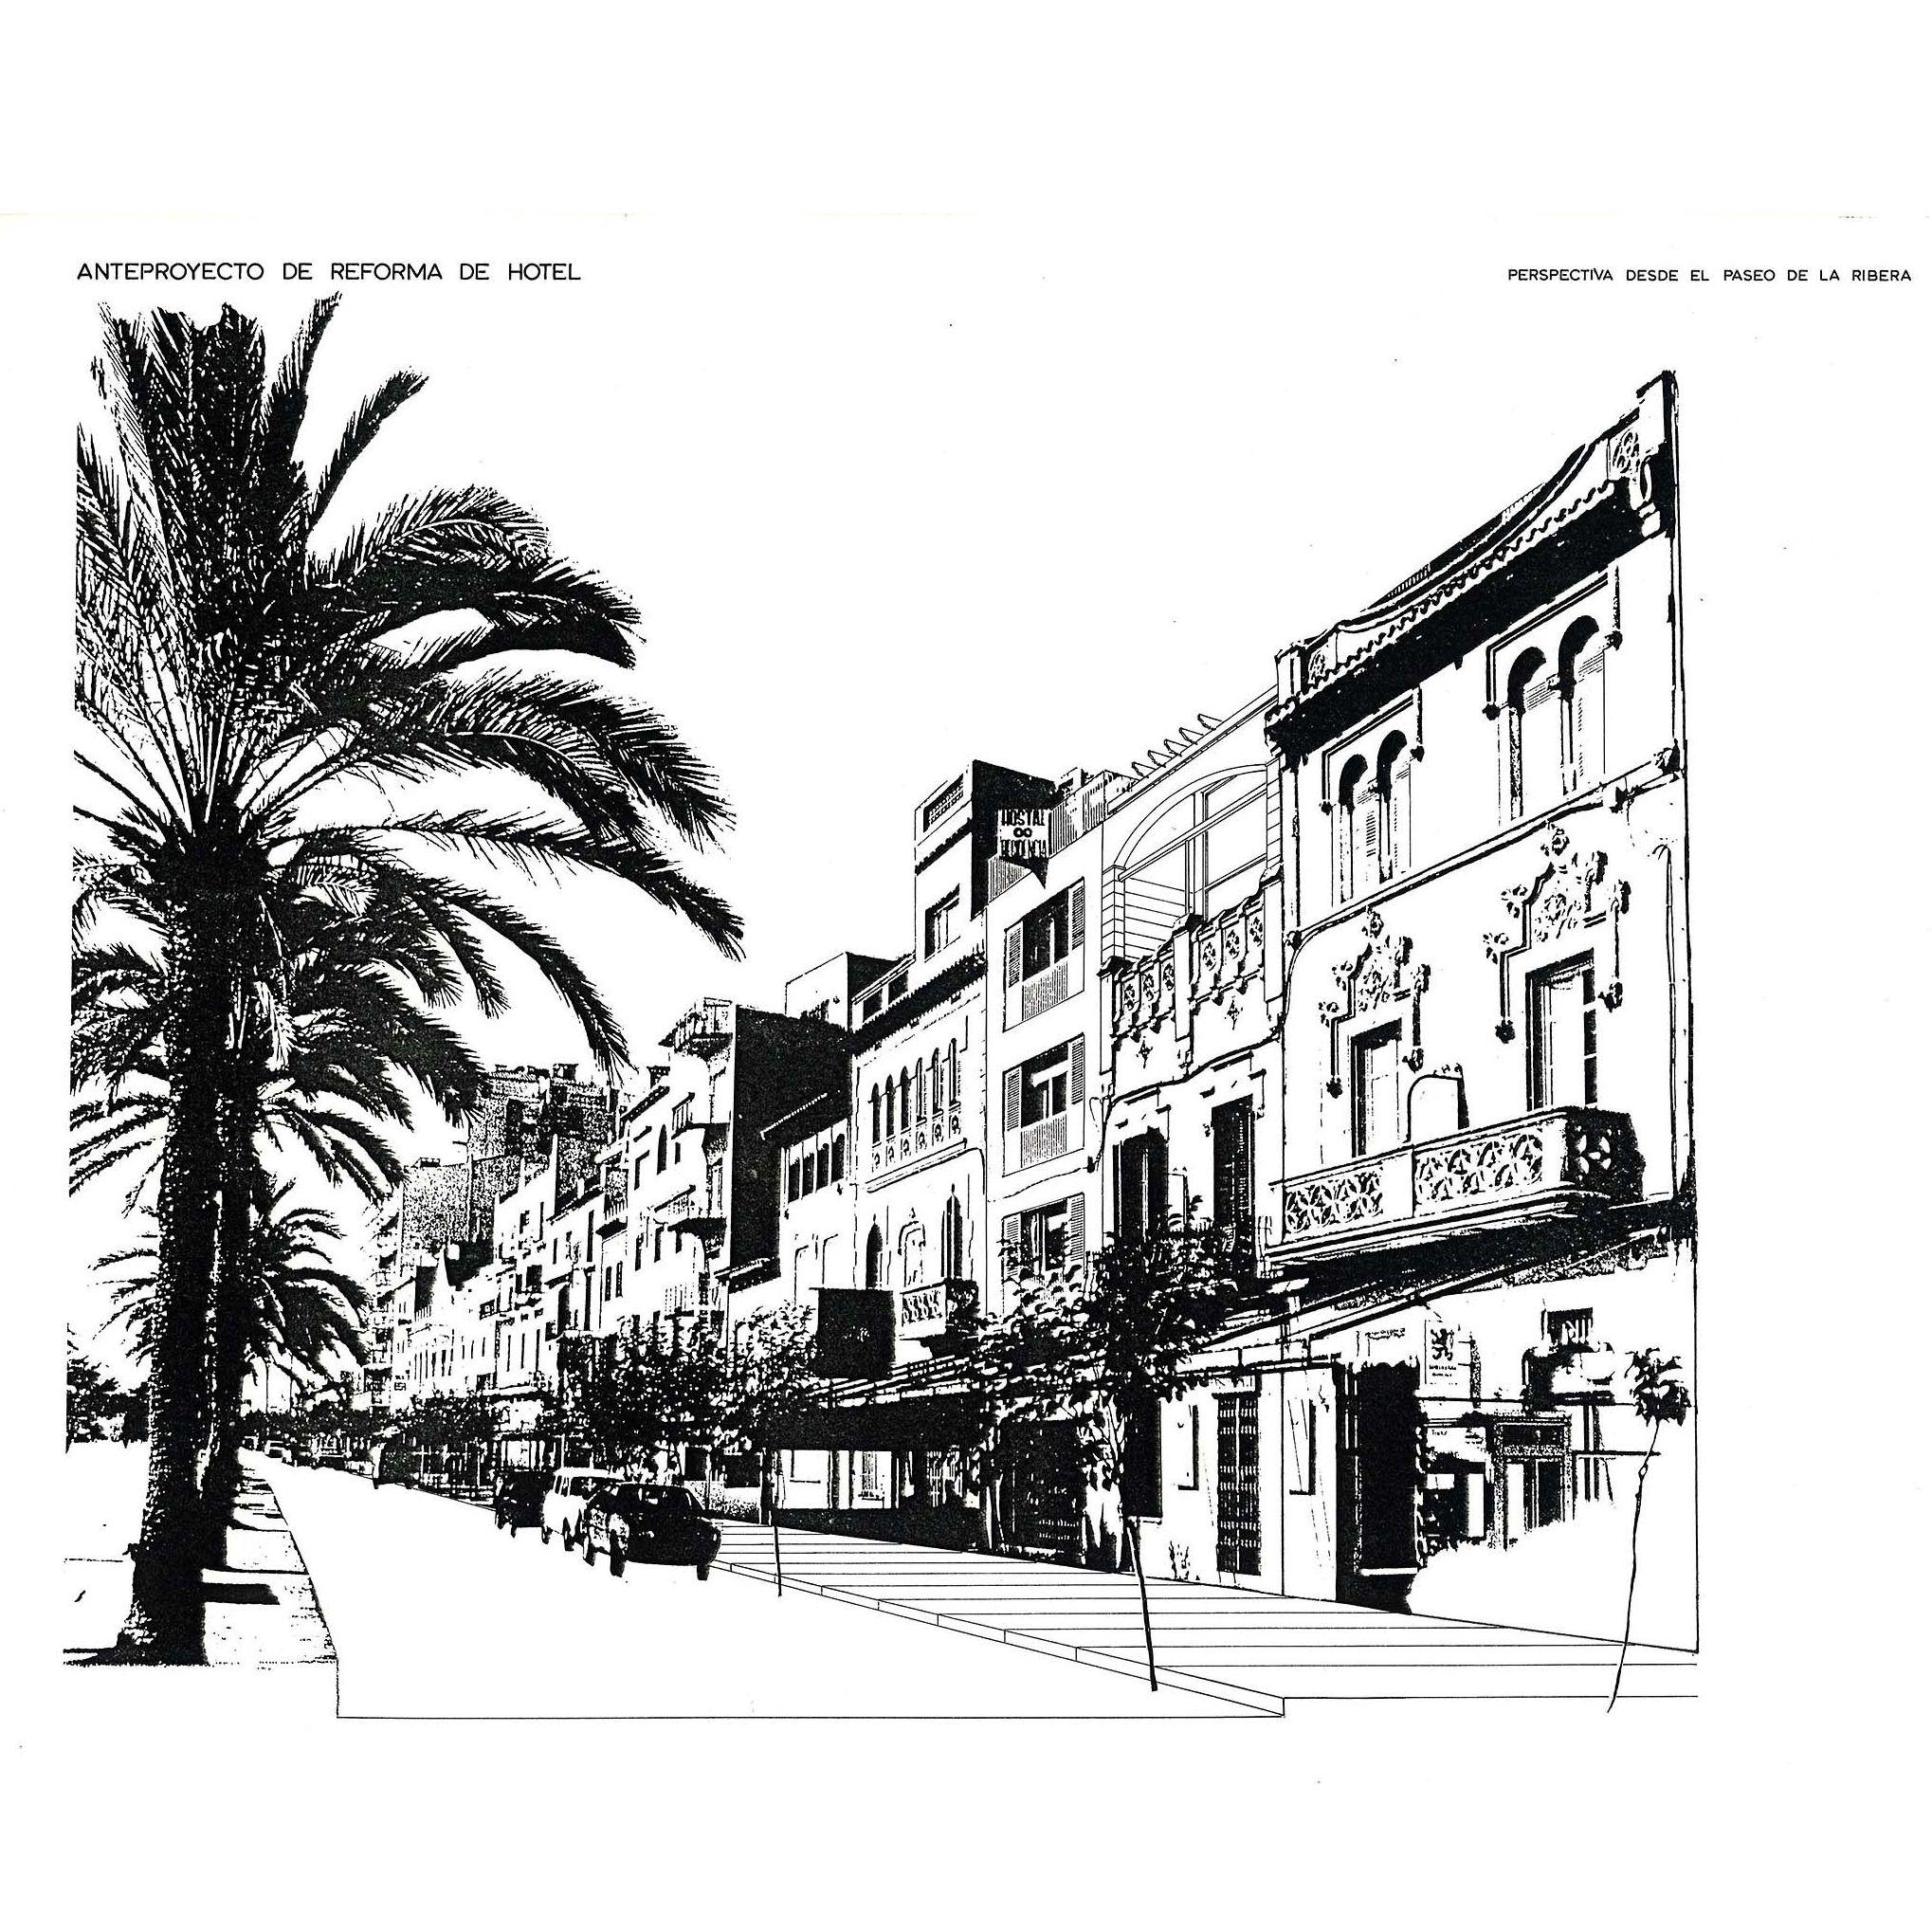 Hotel Santa Maria   #paseodelaribera #sitges #fpmarquitectura #1986 #acuarela watercolor #ink